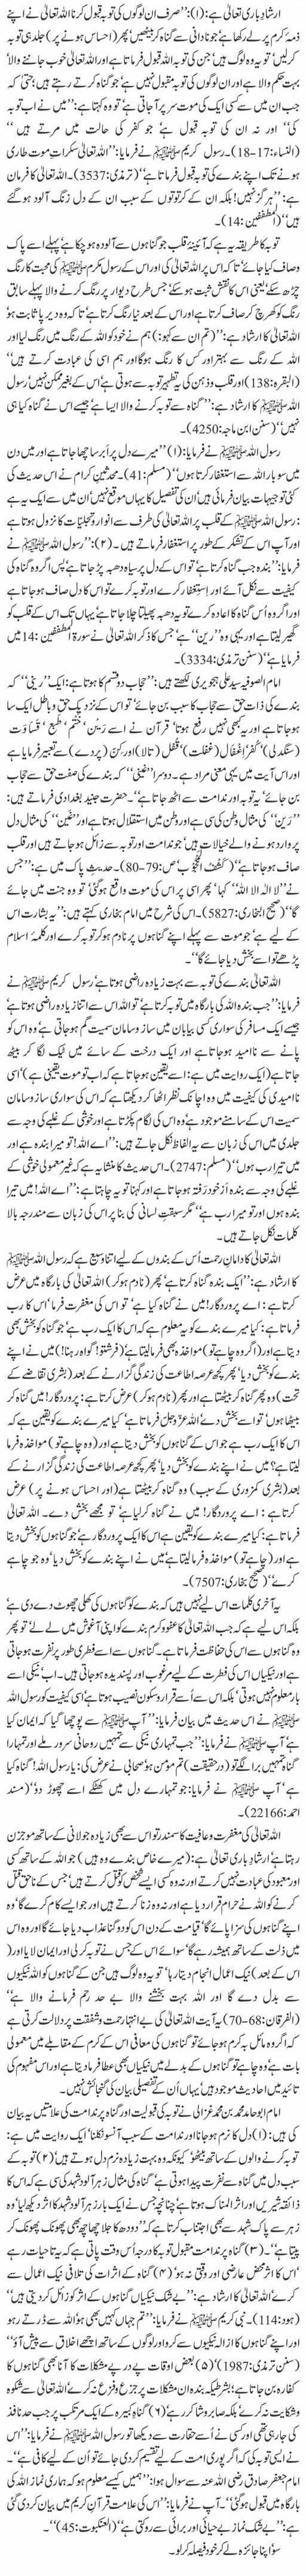 Tauba Ki Haqeeqat (hisa do)